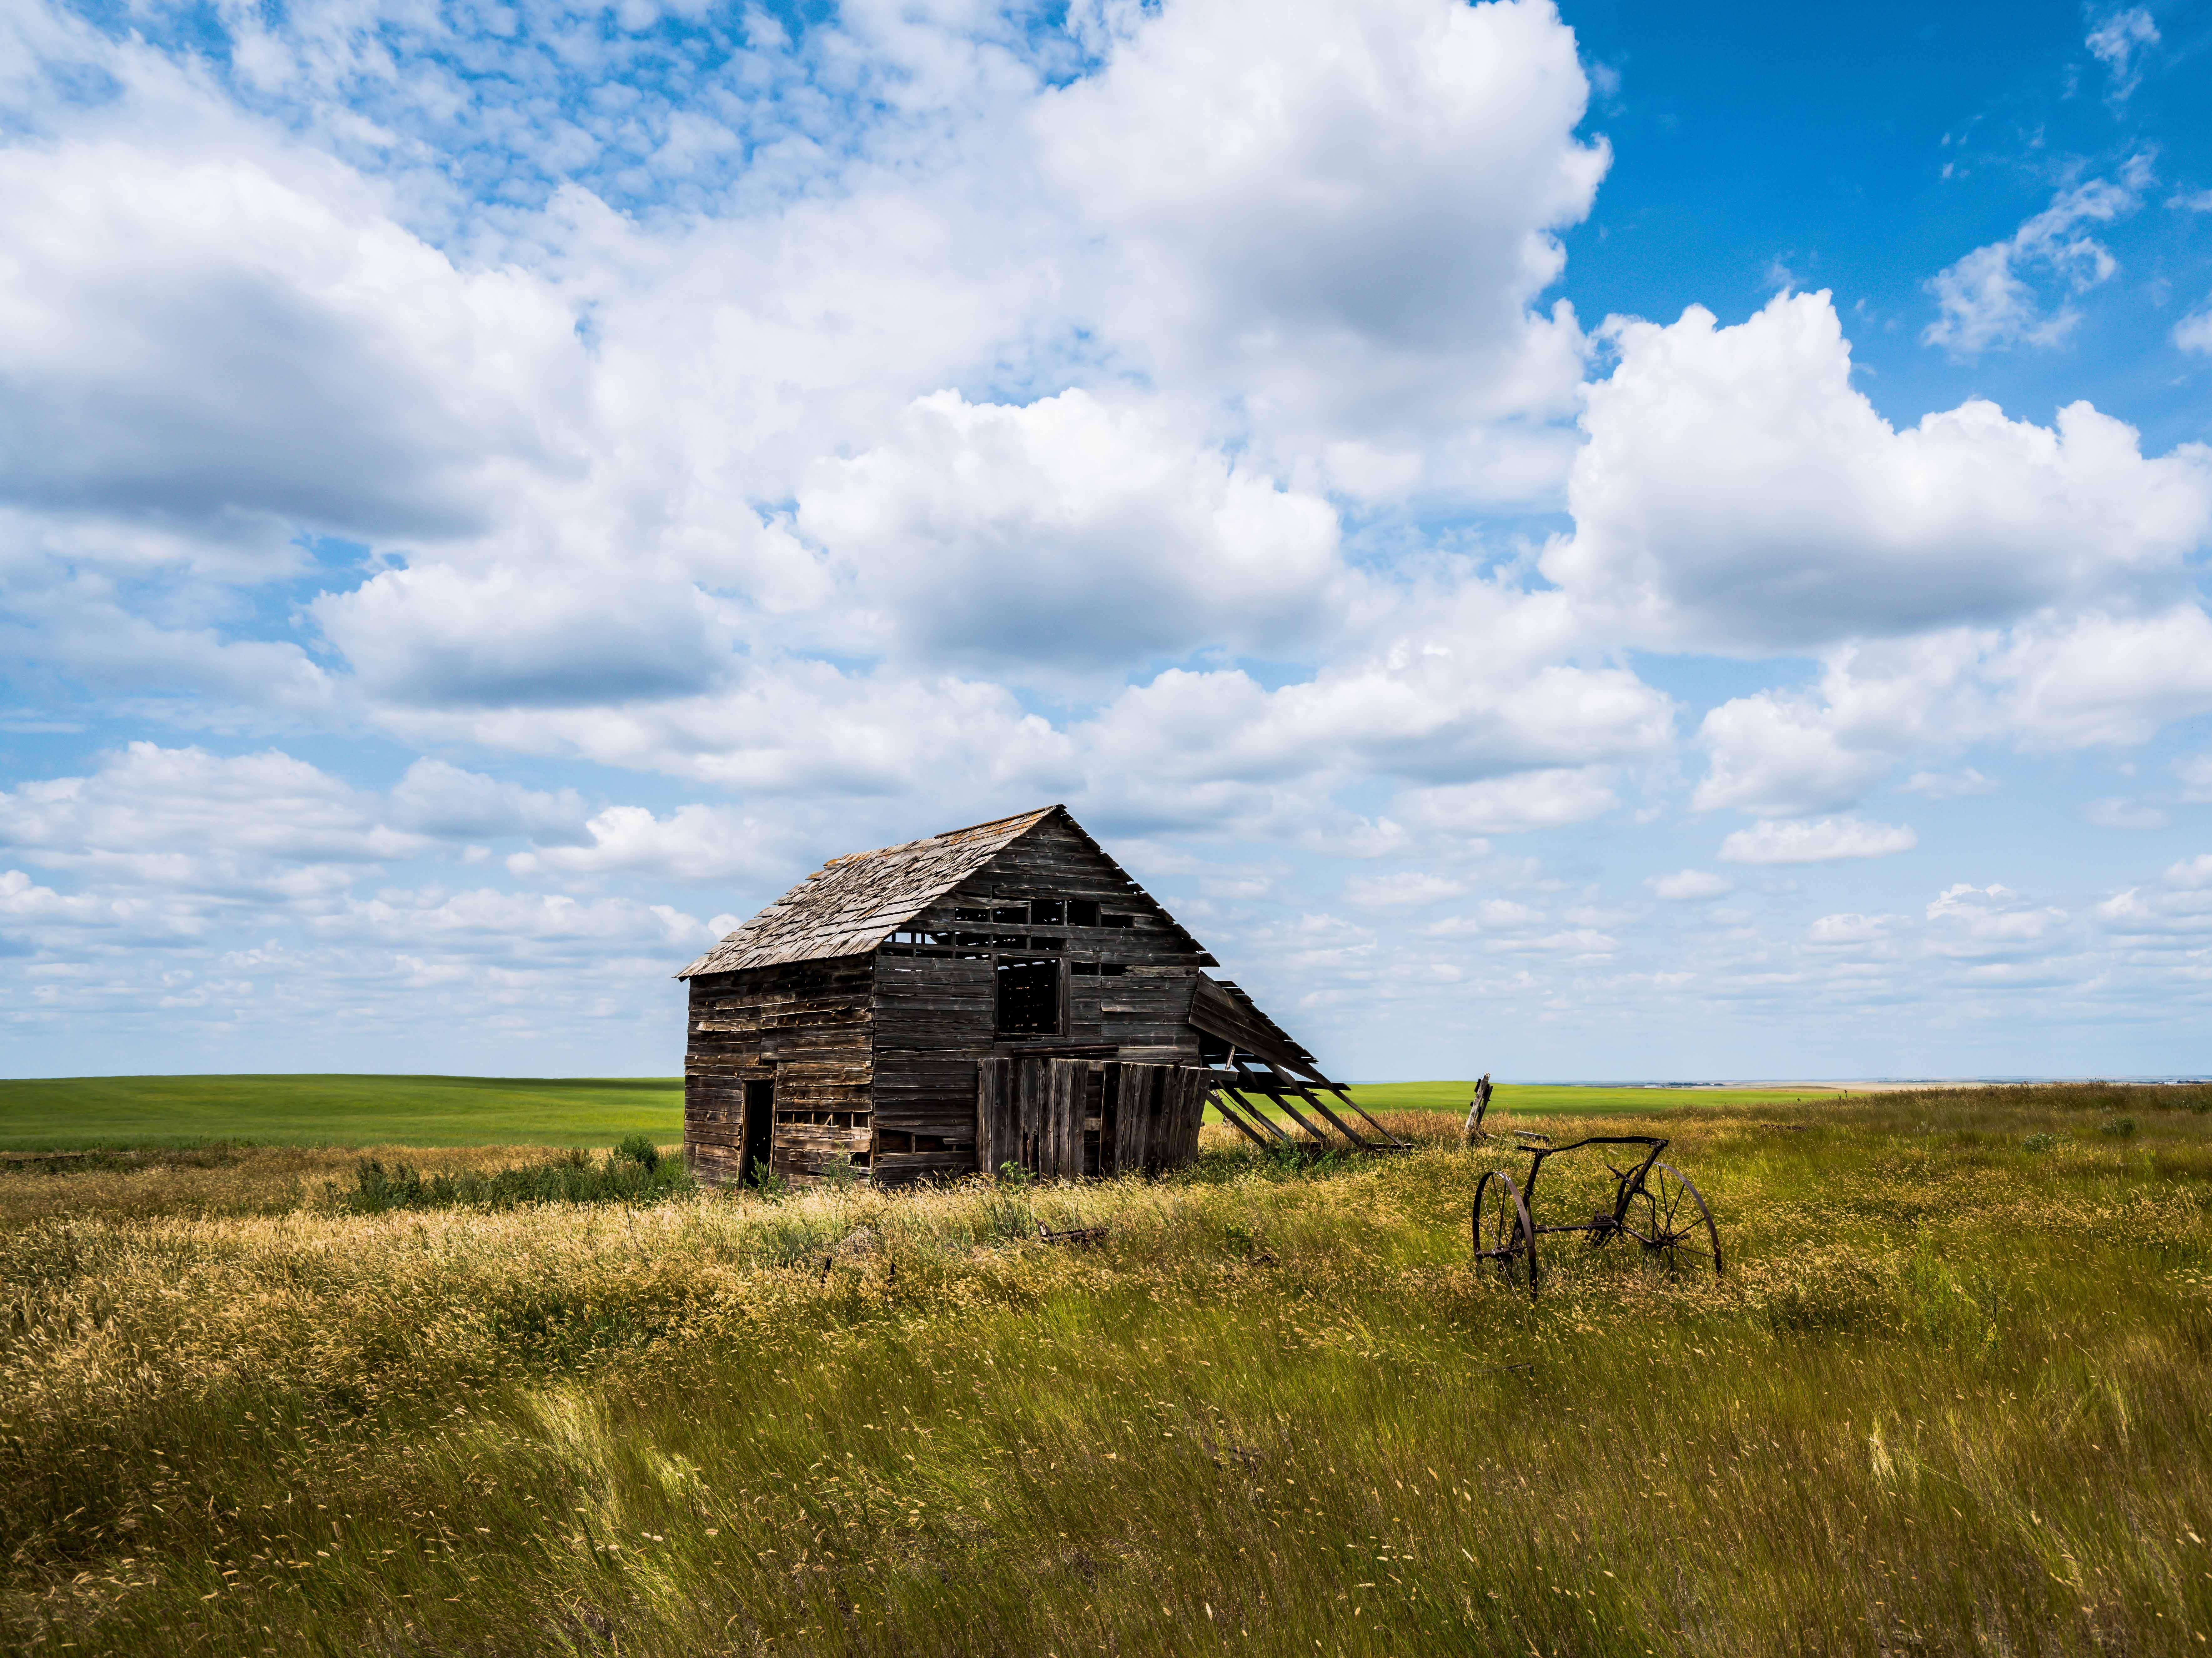 A barn near Larslan weathers away.